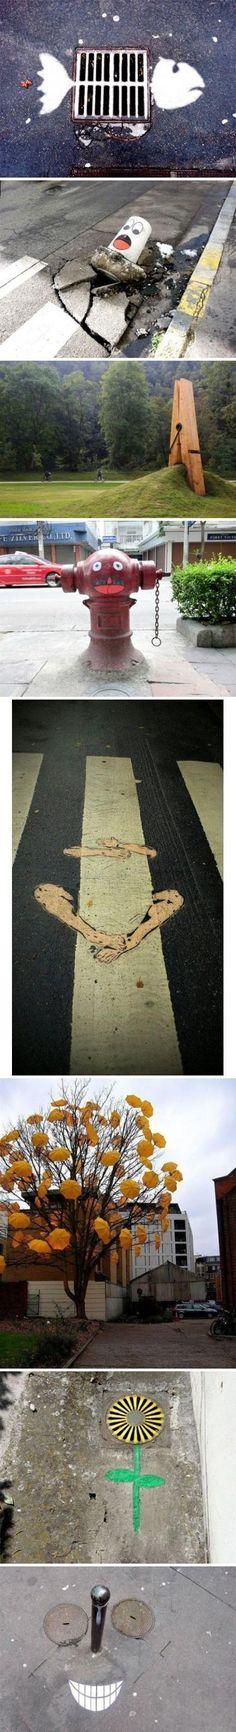 Creative street art - Brightening your day!